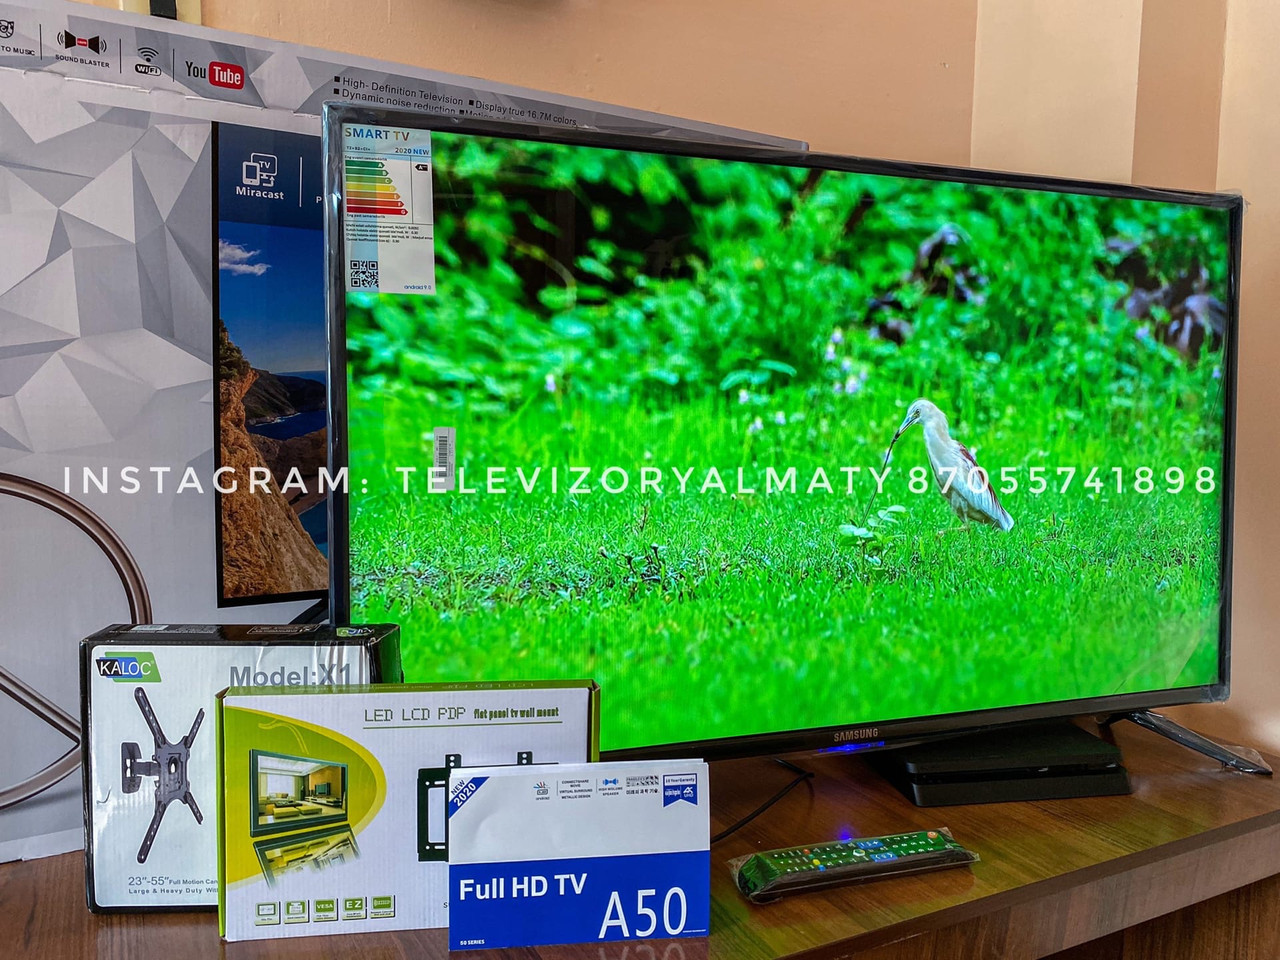 Телевизор LED TV Samsung Smart tv 42 диагональ - фото 3